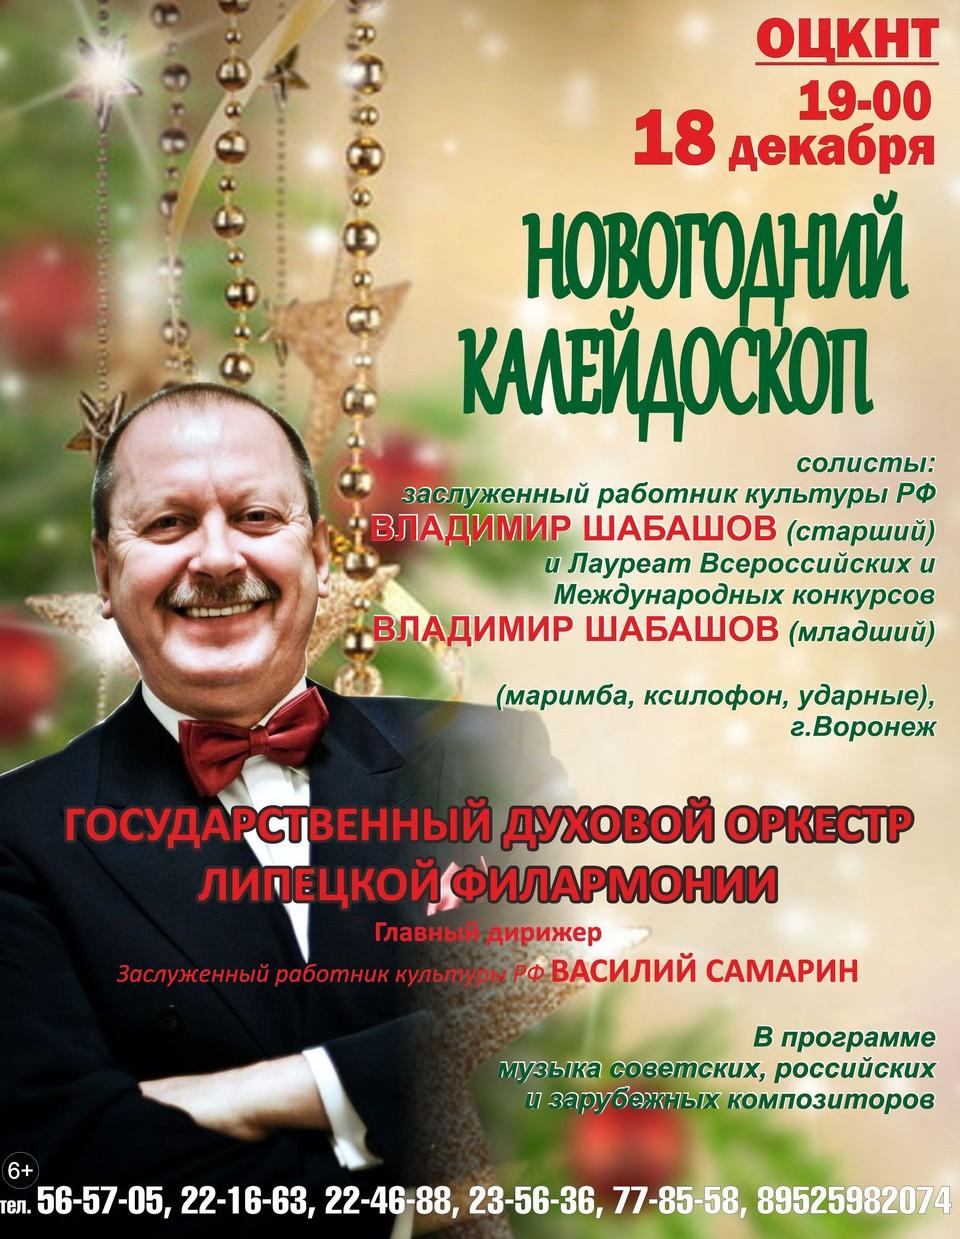 Липчан приглашают на новогодний концерт